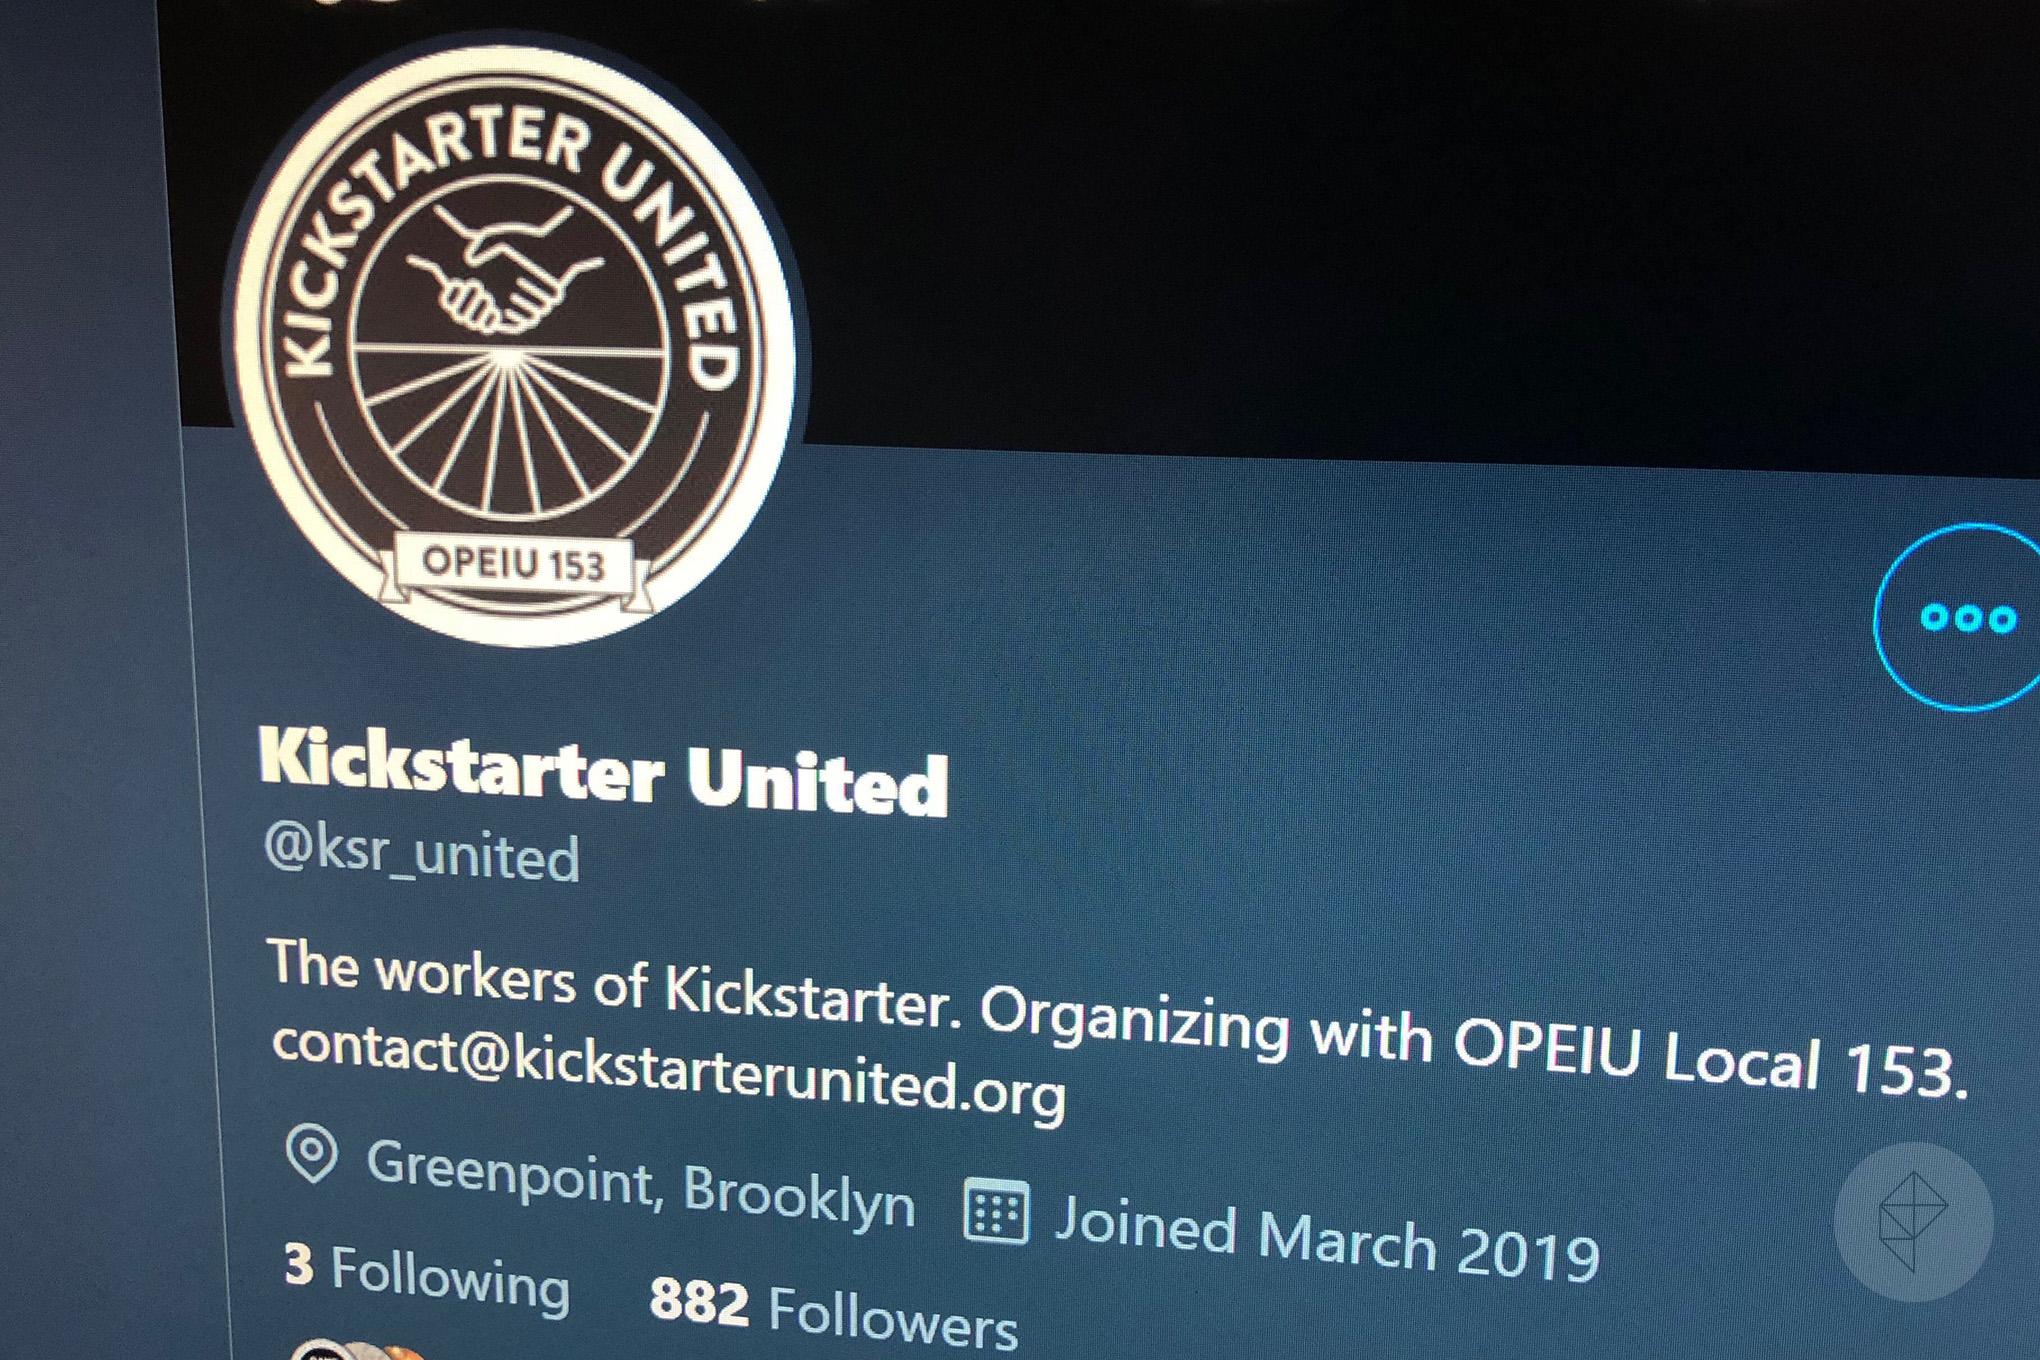 Kickstarter under fire from creators over labor dispute